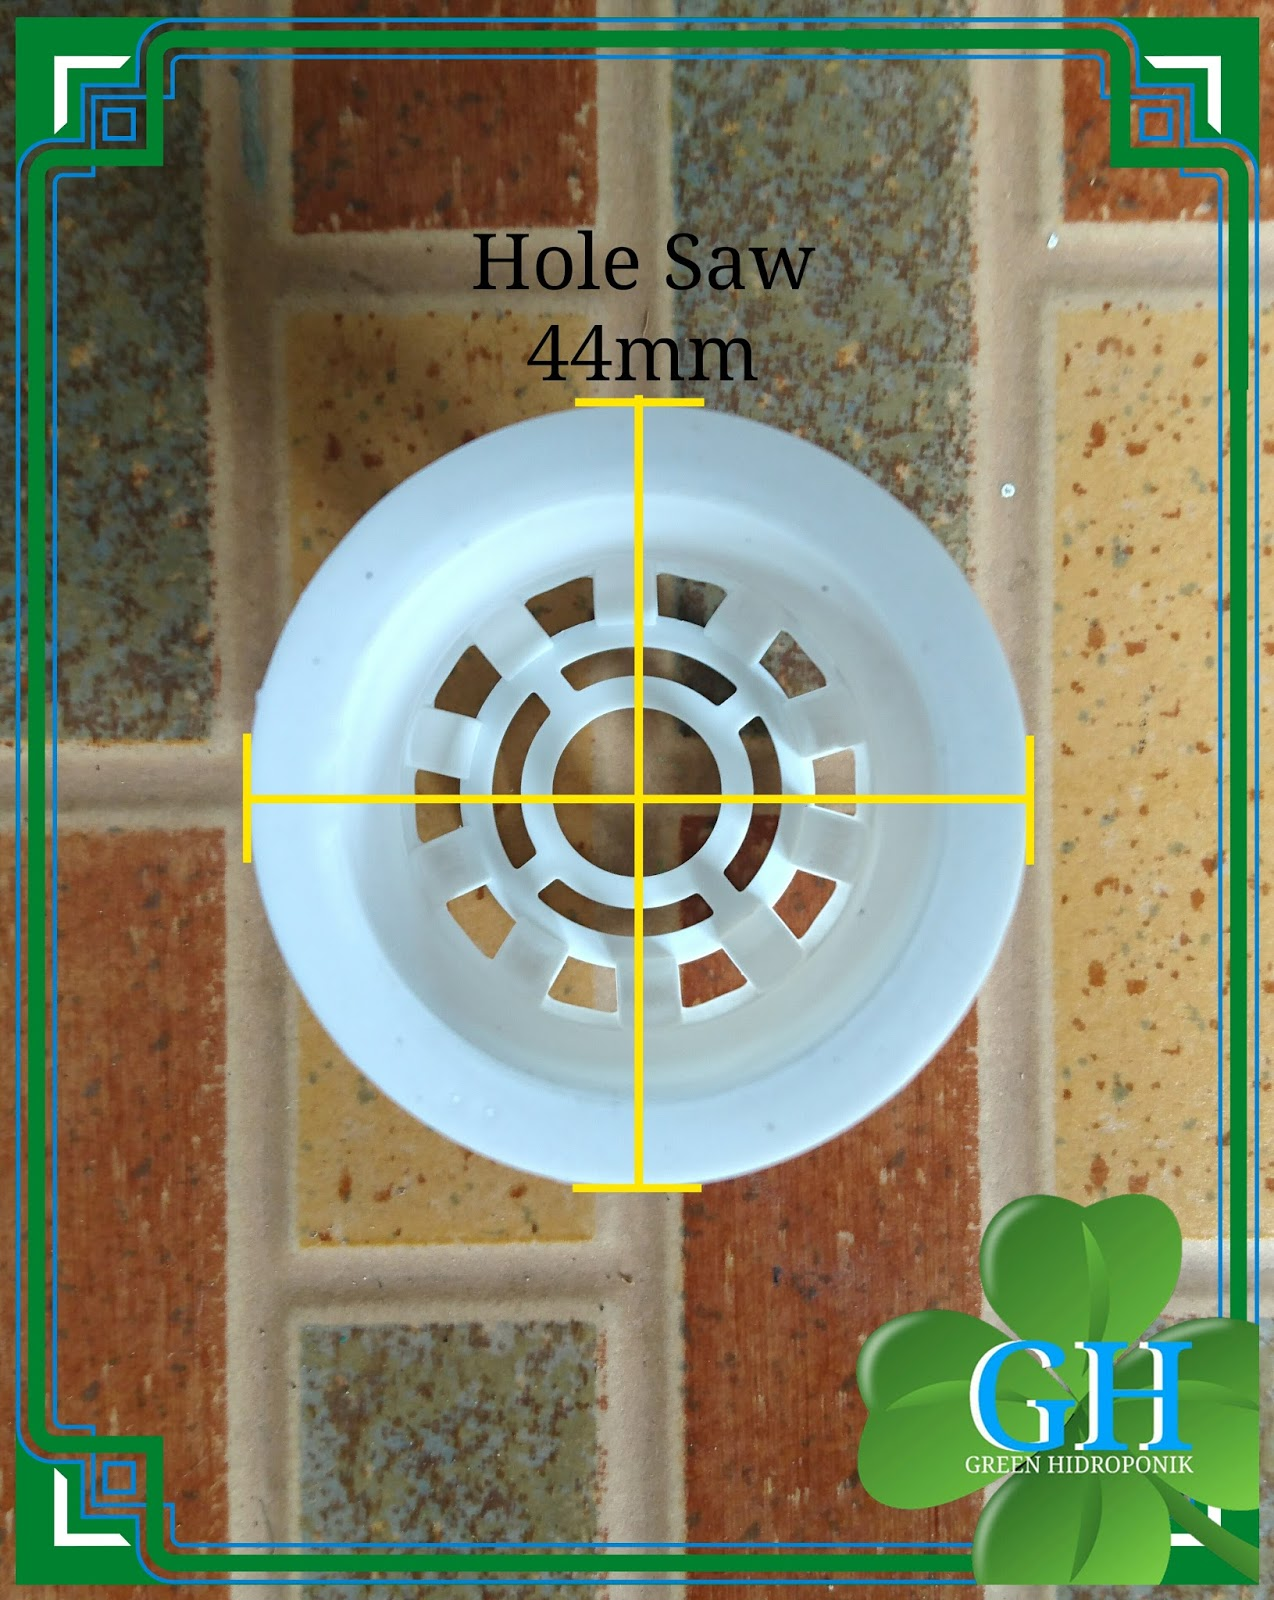 Netpot Hidroponik Net Pot Kecil Atas 55cm 5cm Tinggi Putih Hitam Gambar Produk Lainnya